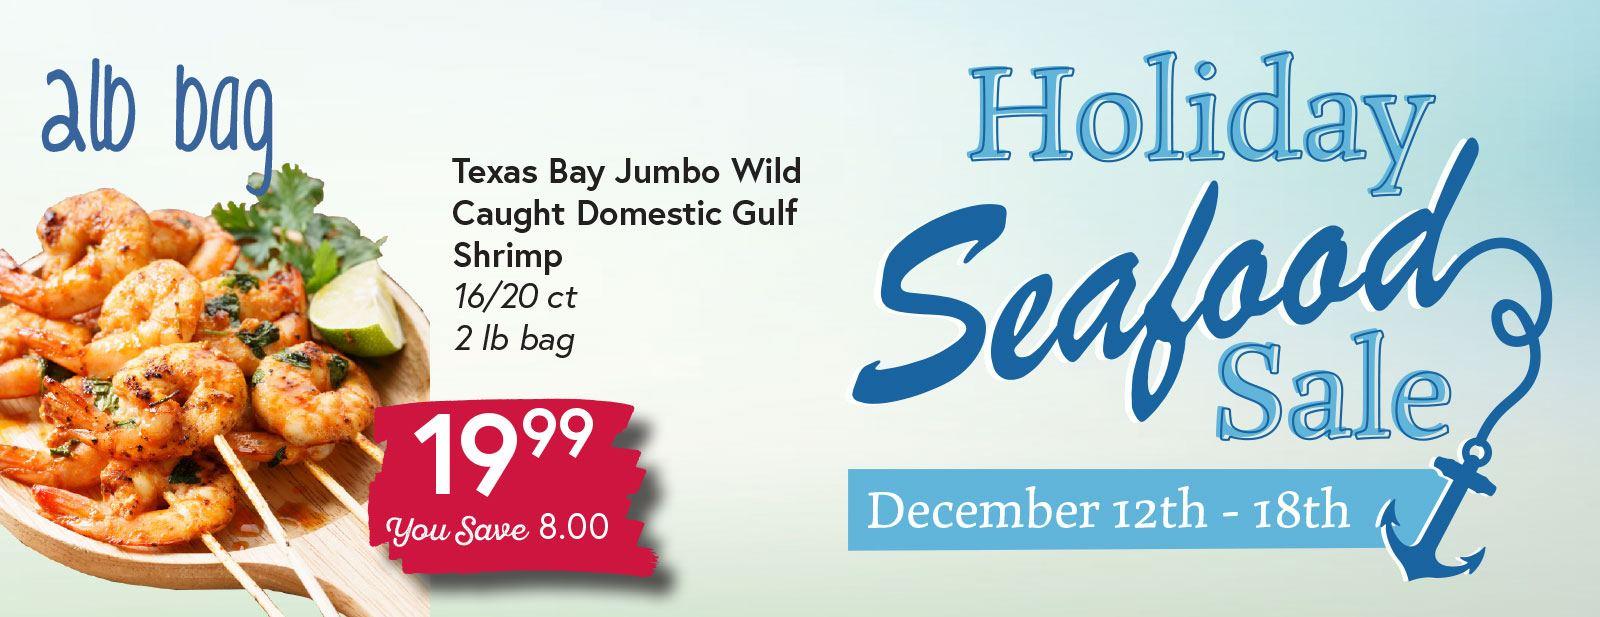 Holiday Seafood Sale December 12 - December 18